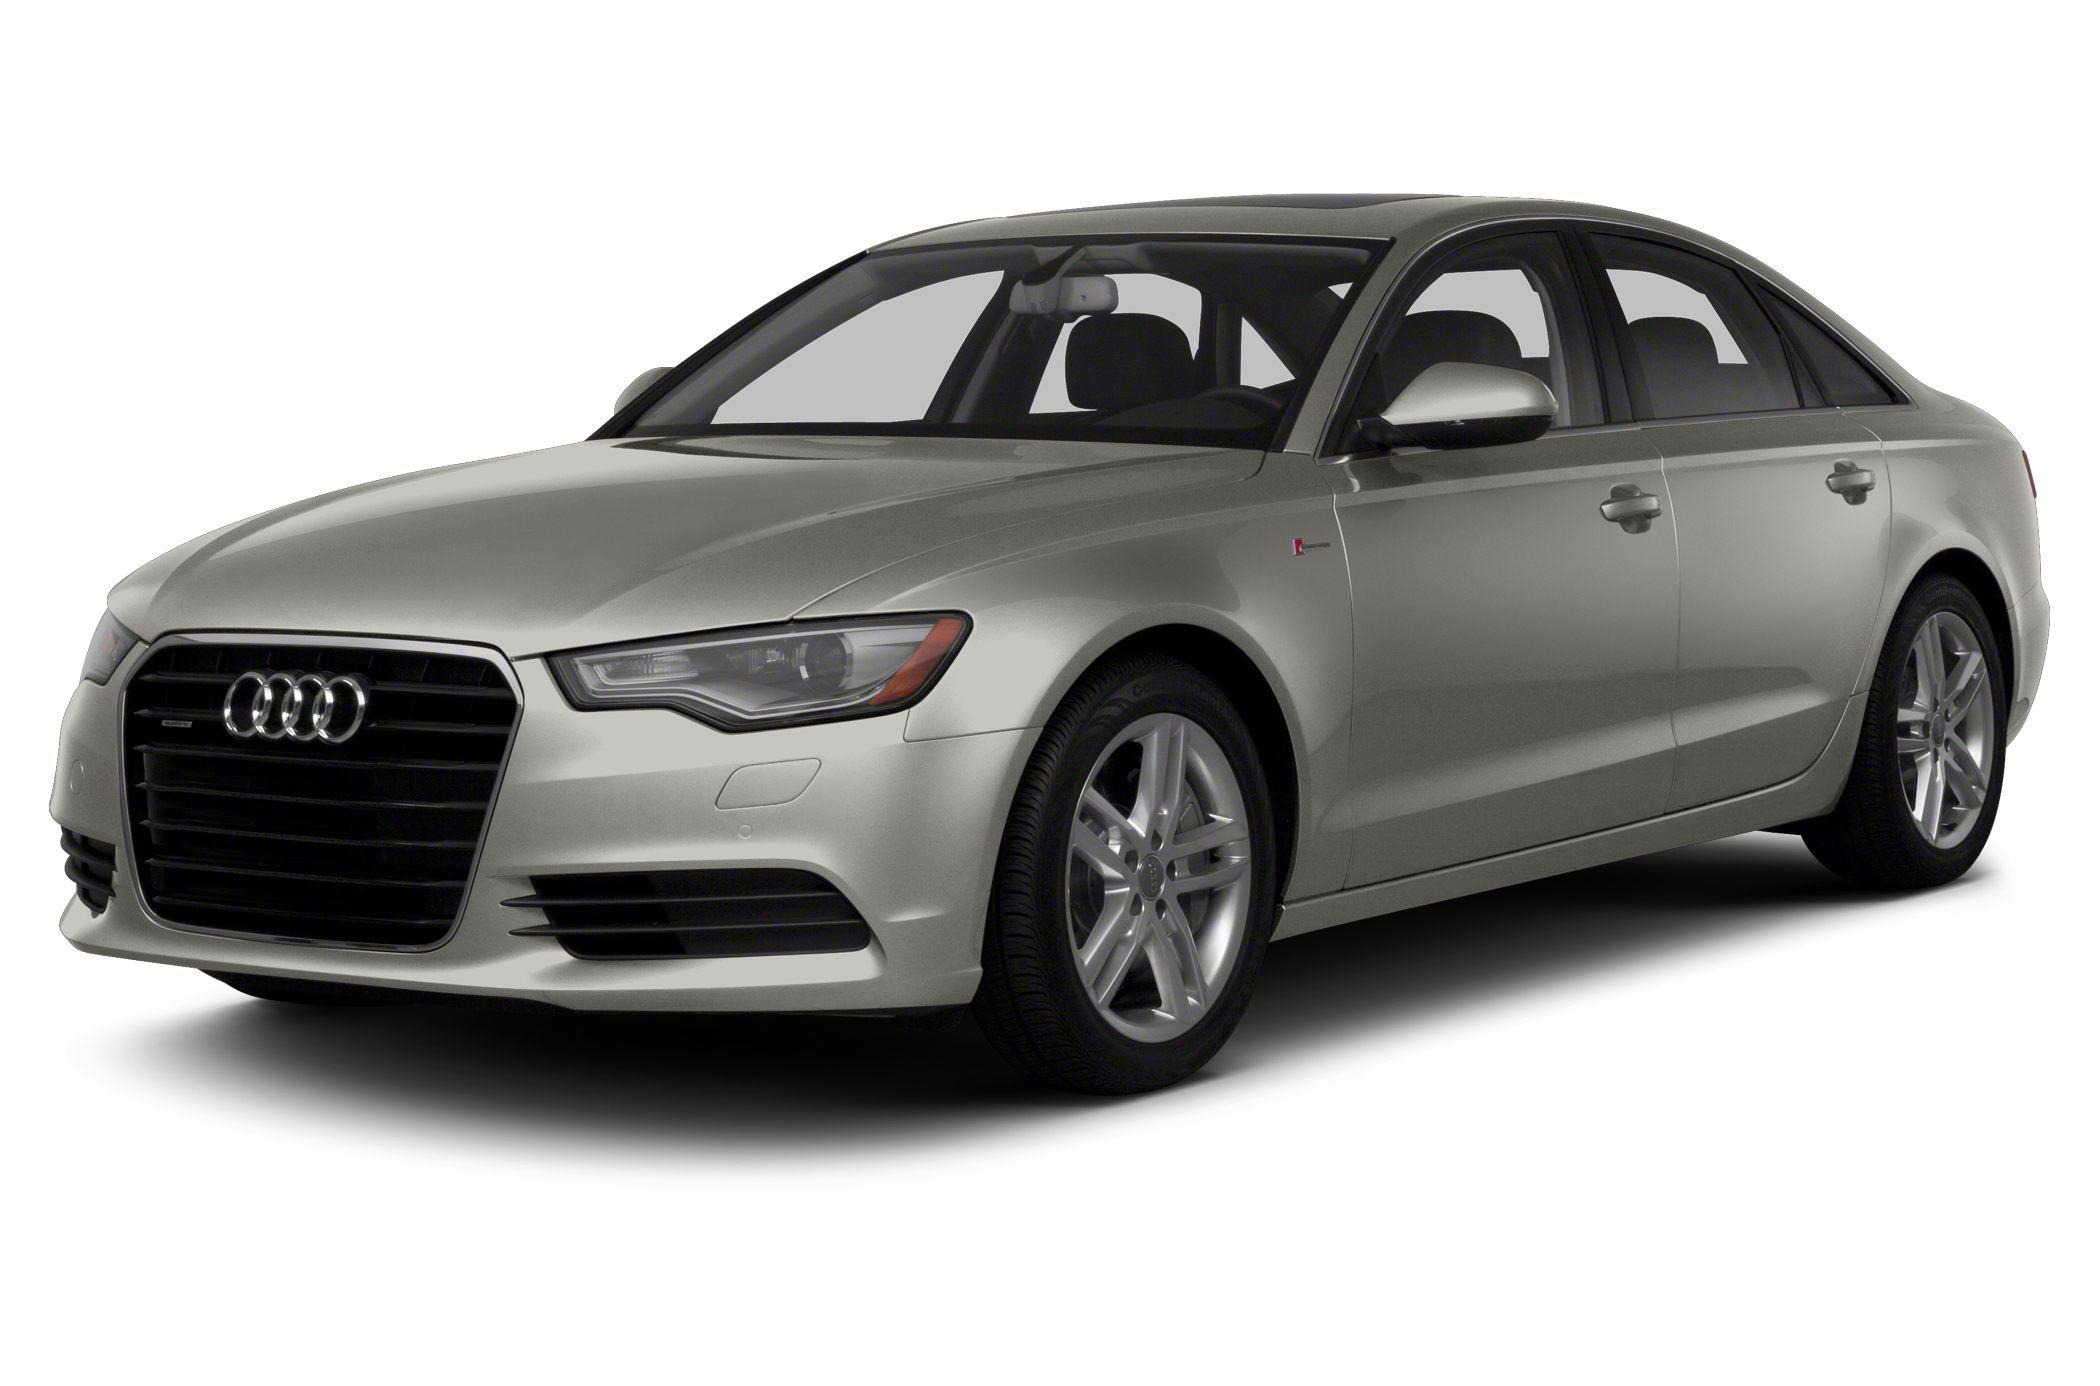 2014 Audi A6 Information